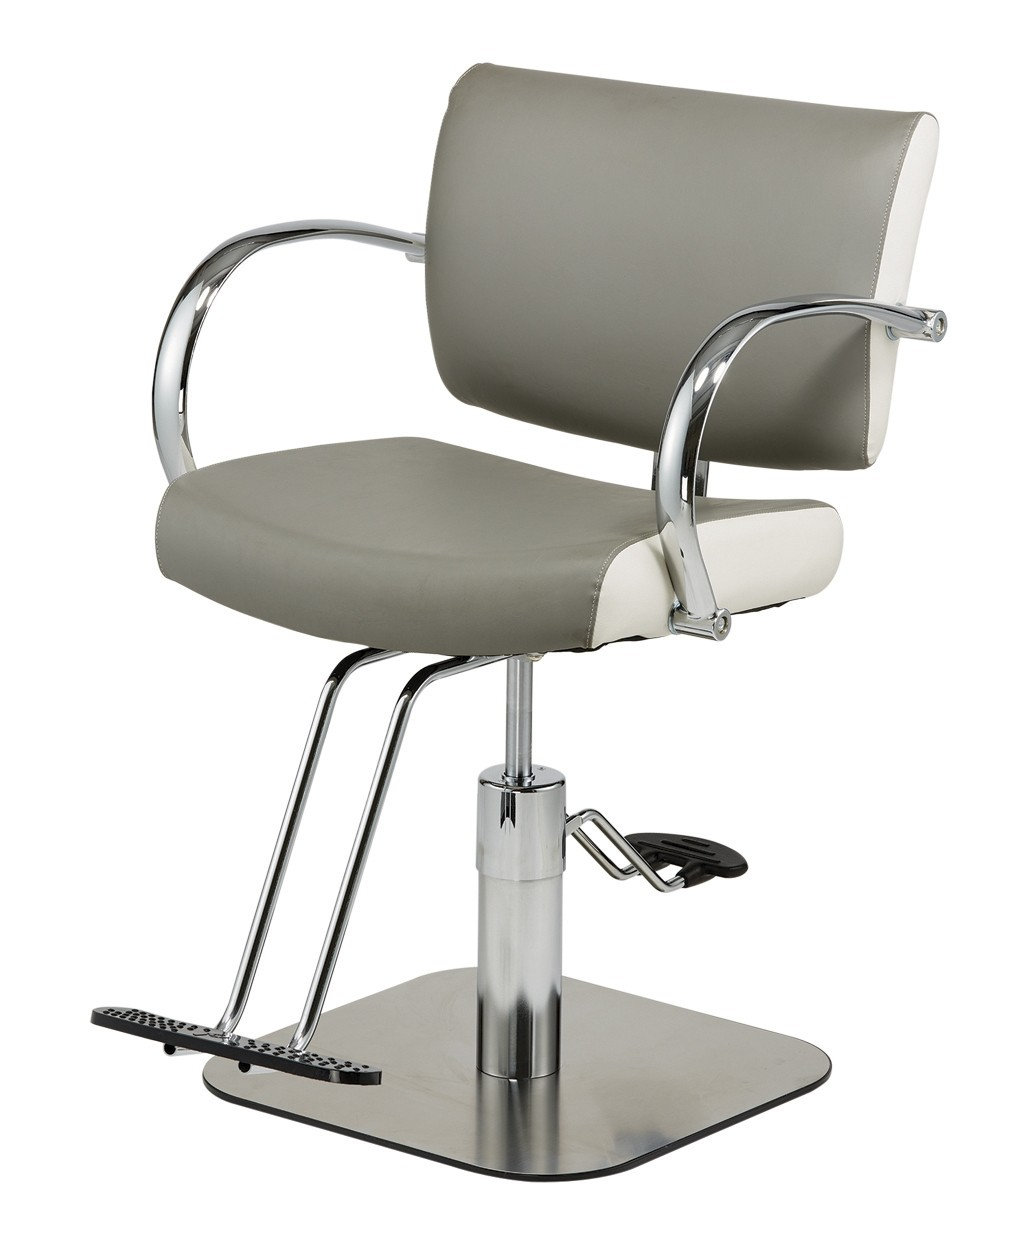 Pibbs 4506 Bari Styling Chair